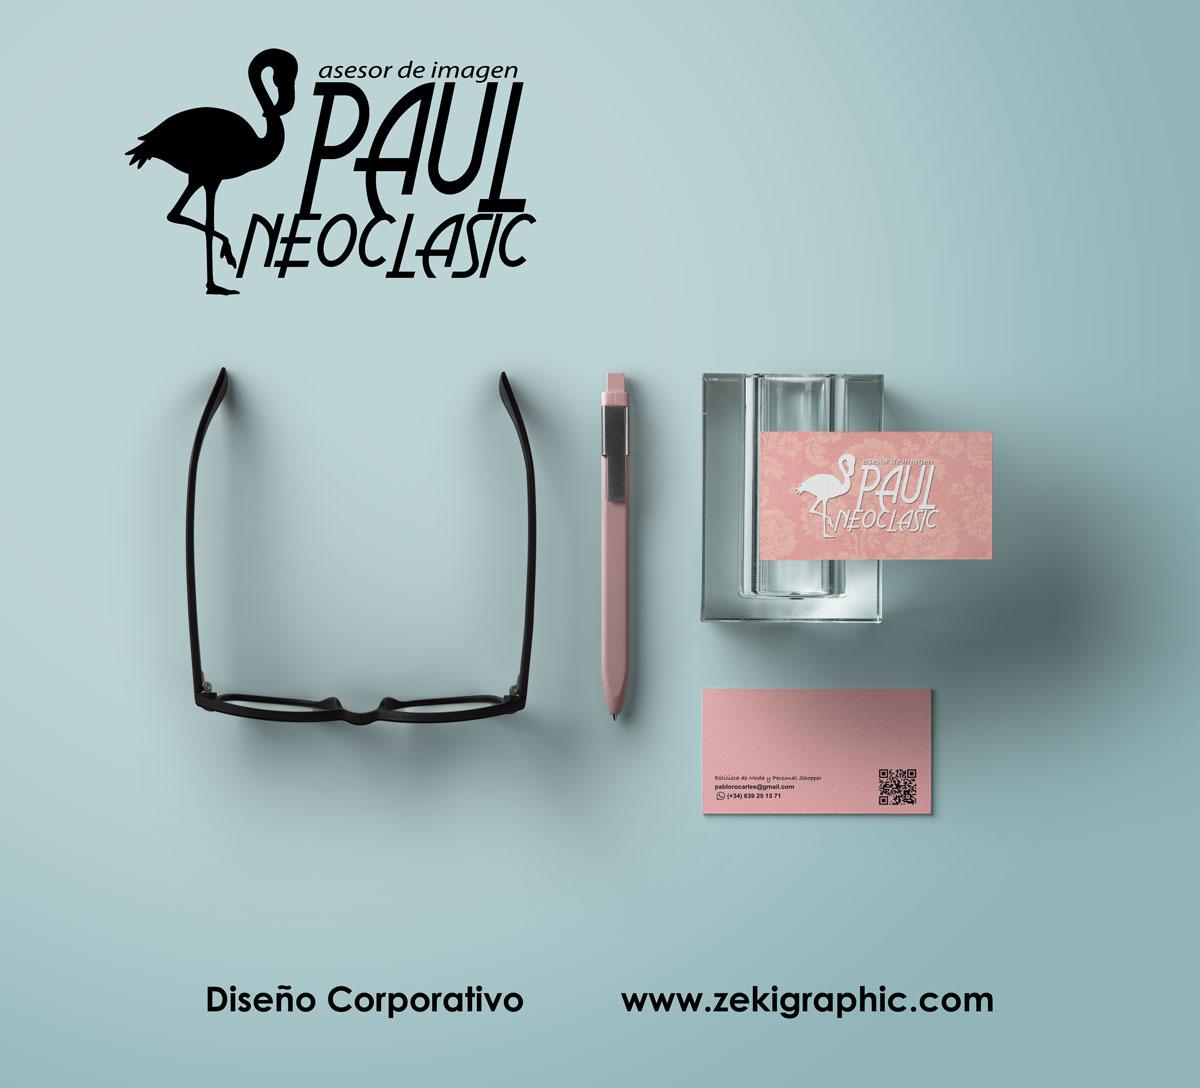 diseno_corporativo_redes_sociales_zekigraphic_moda_paulneoclasic